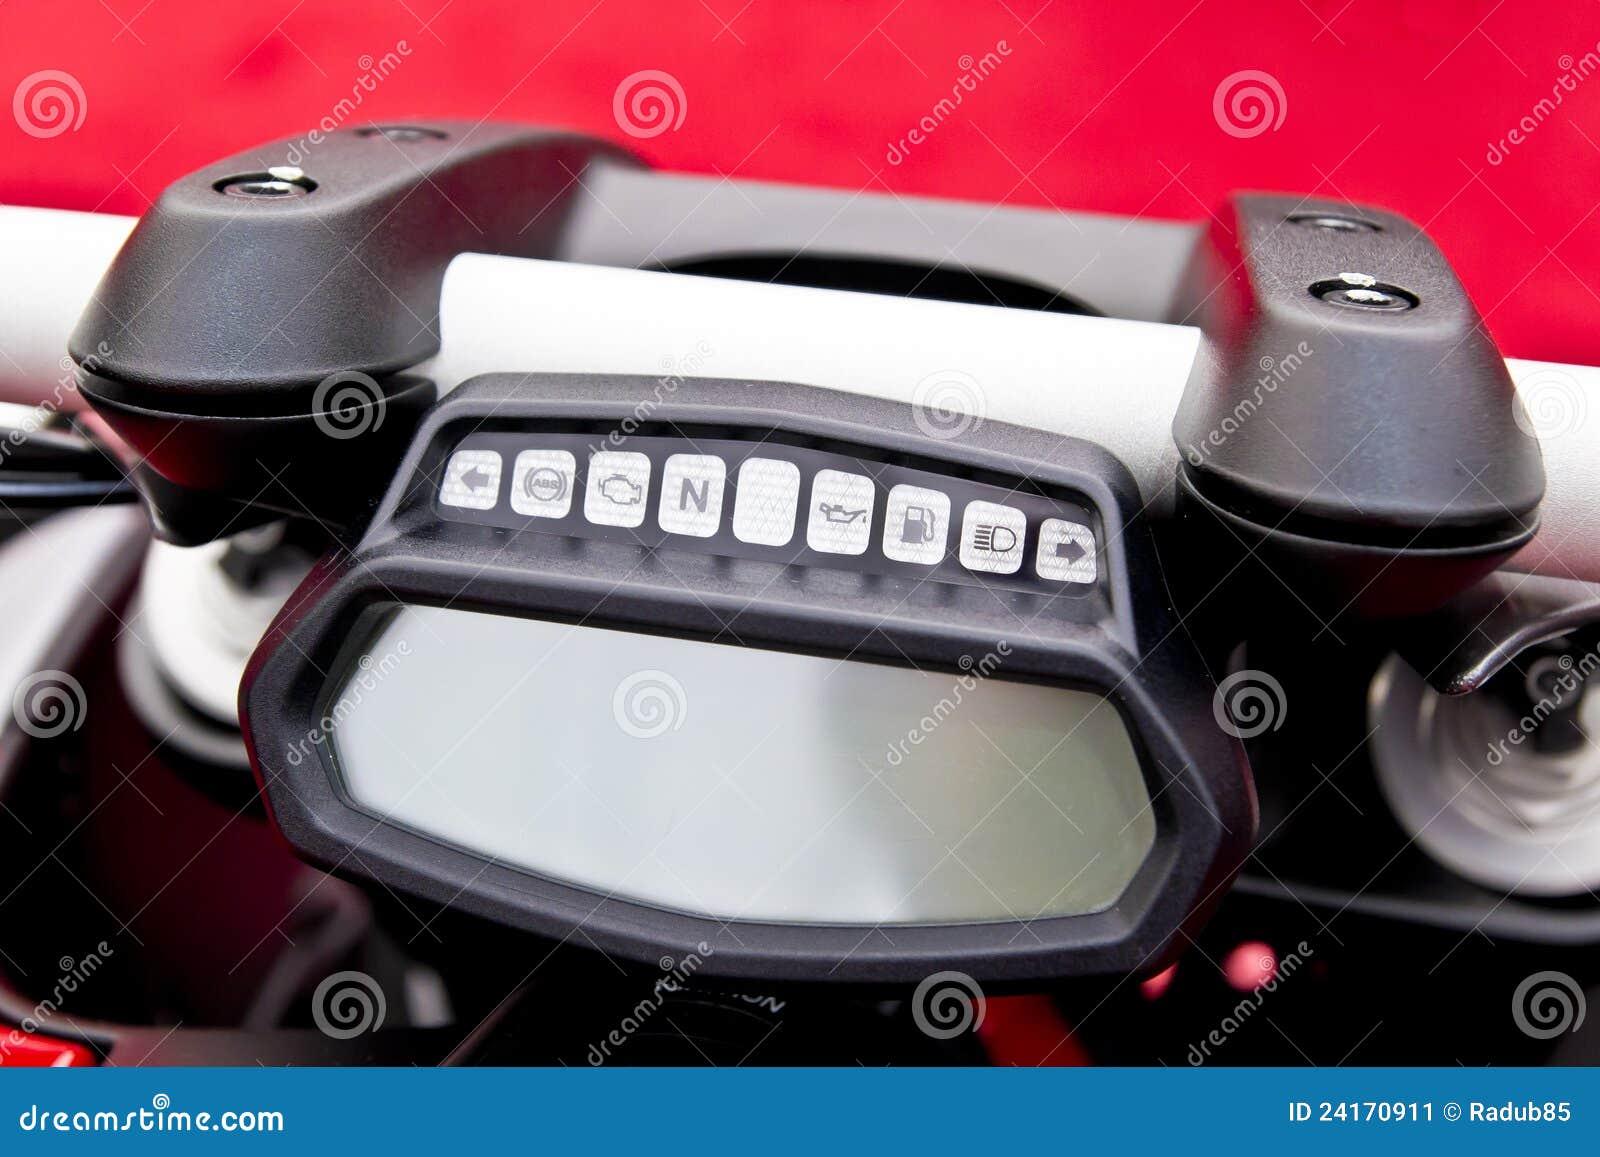 tableau de bord de moto image stock image 24170911. Black Bedroom Furniture Sets. Home Design Ideas